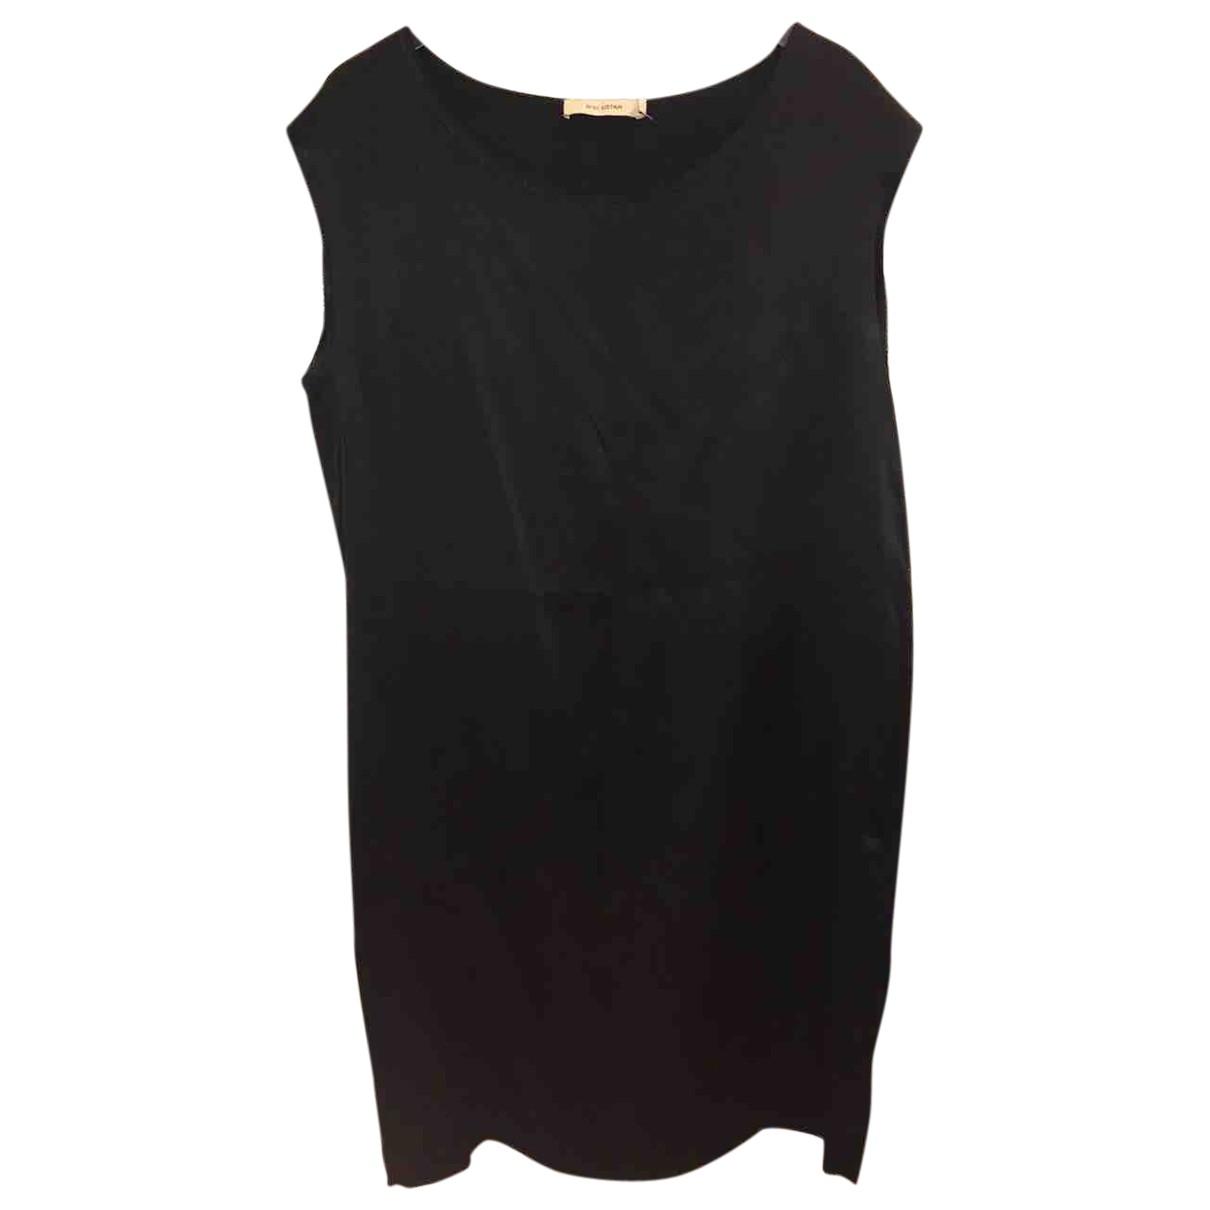 Nili Lotan \N Black Silk dress for Women 38 FR